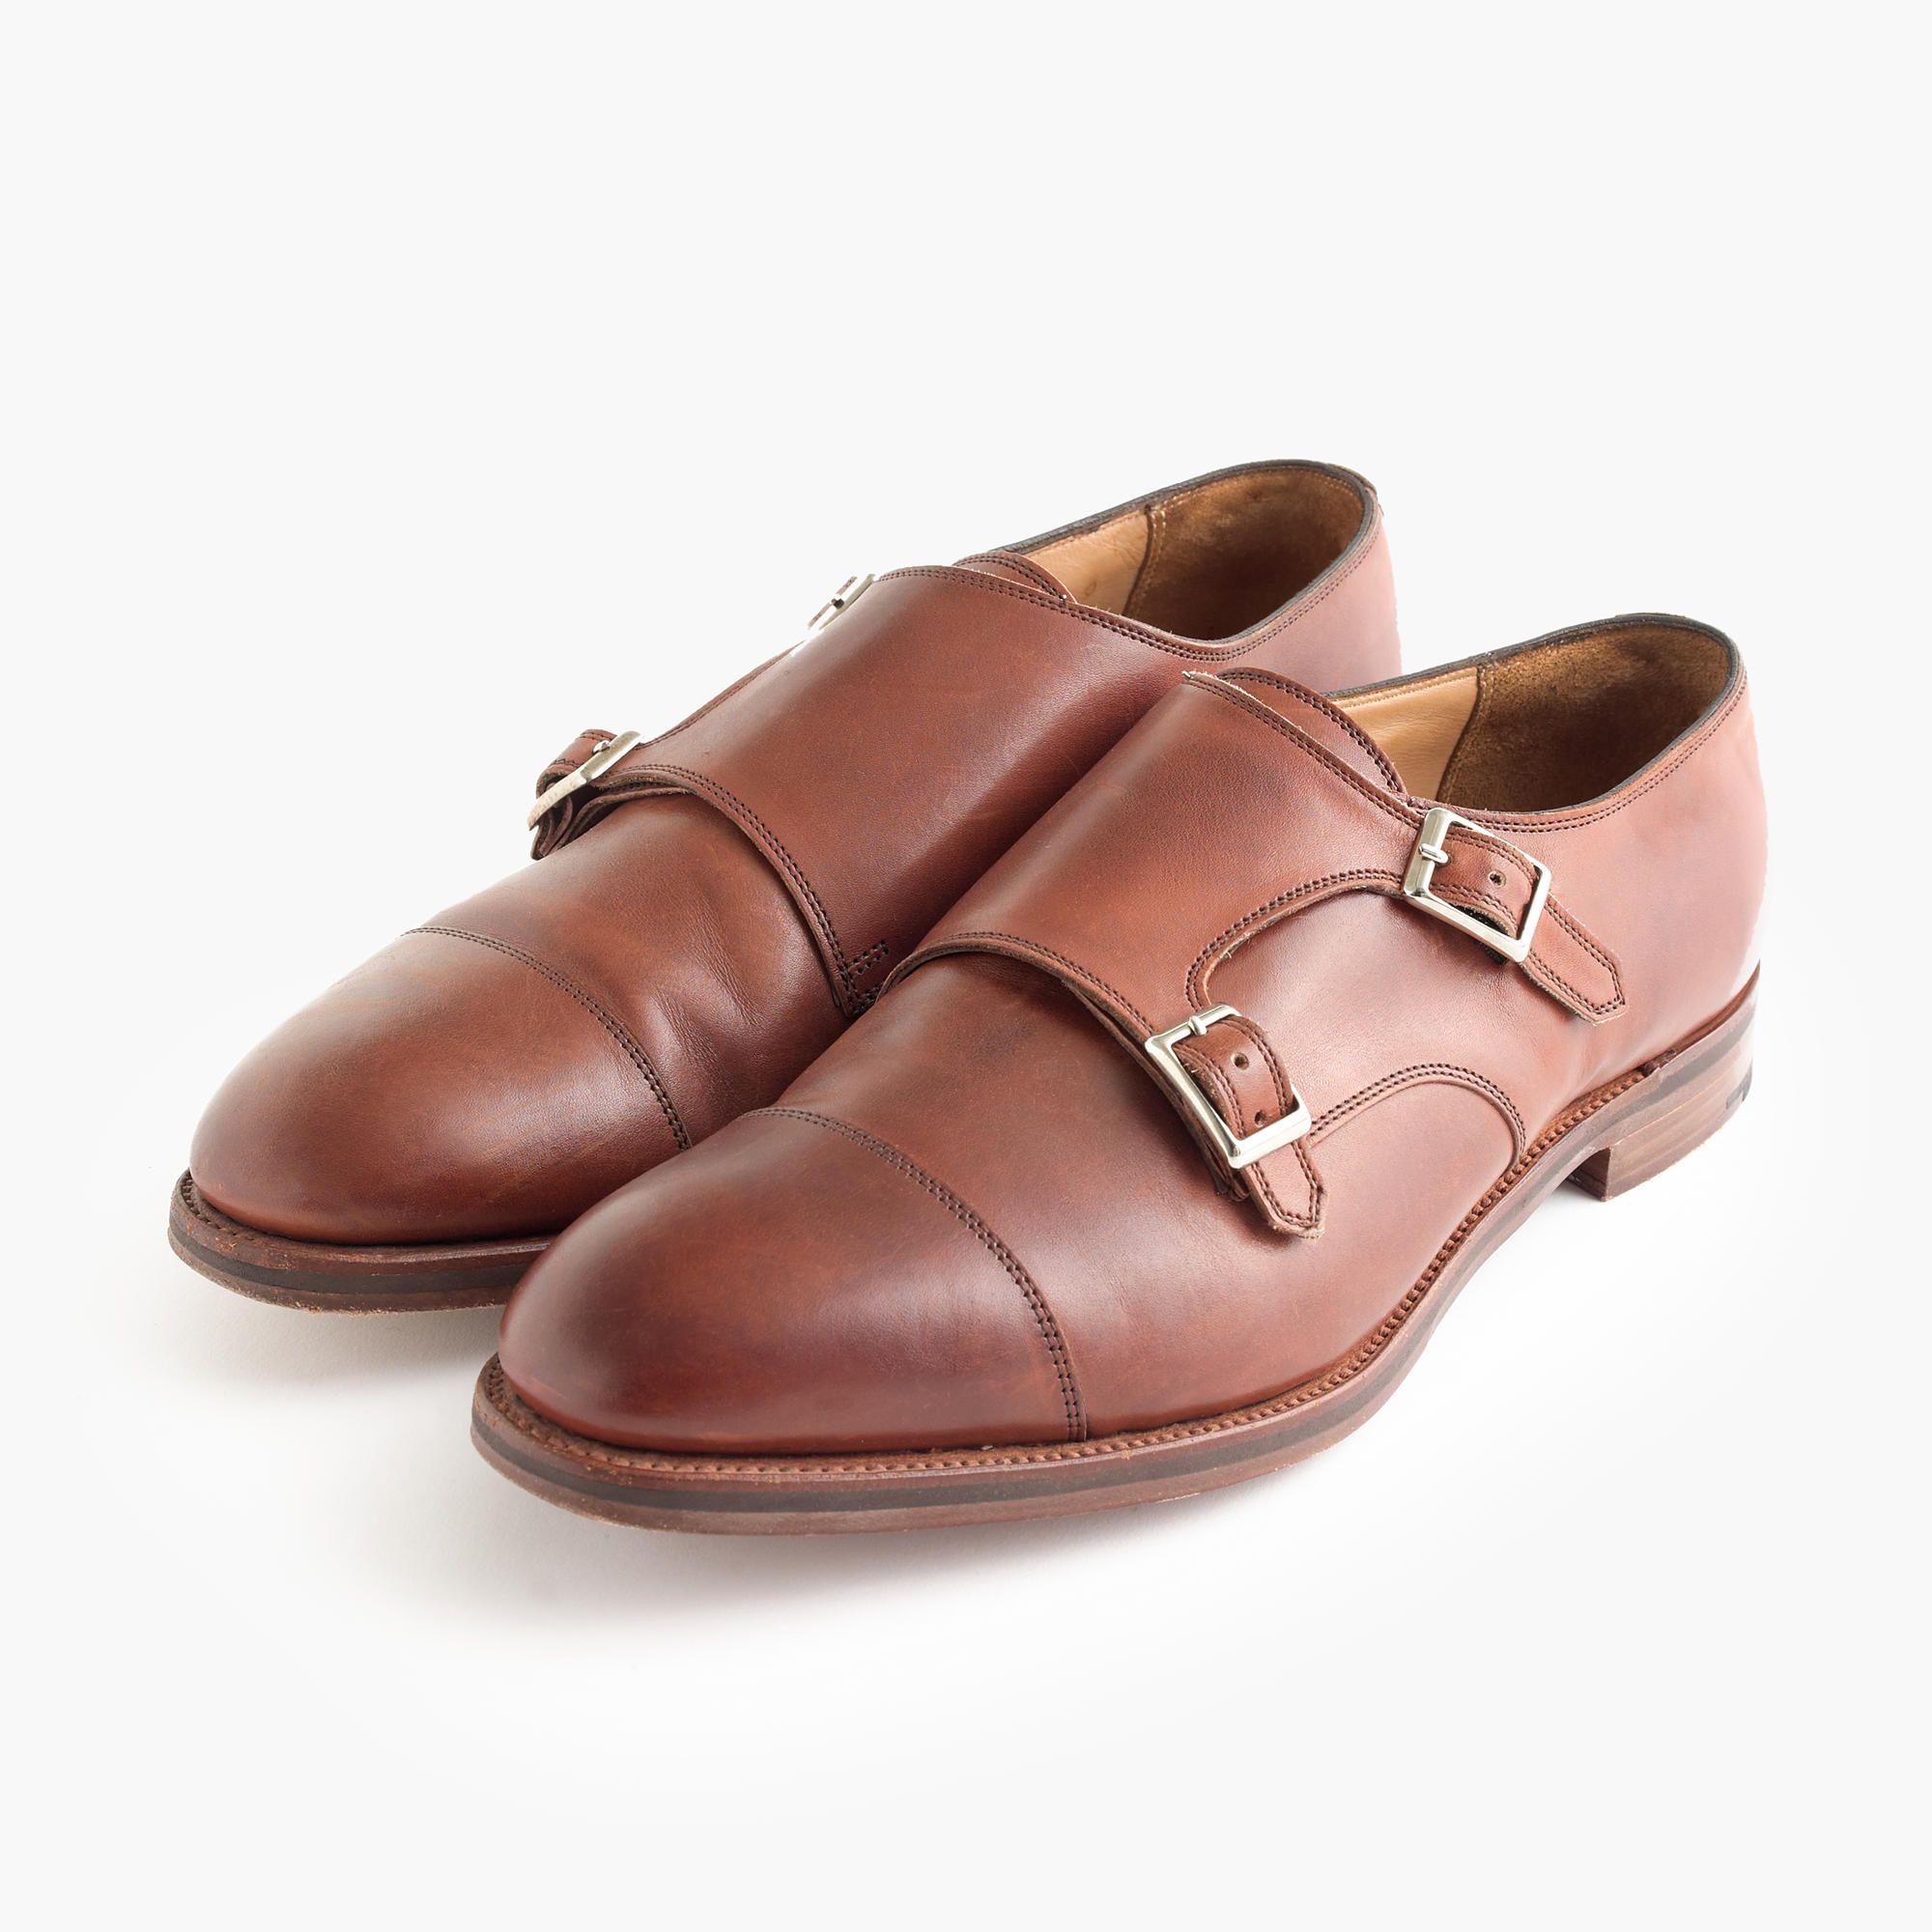 Chaussures - Mocassins Alfred Sargent dZCn9I